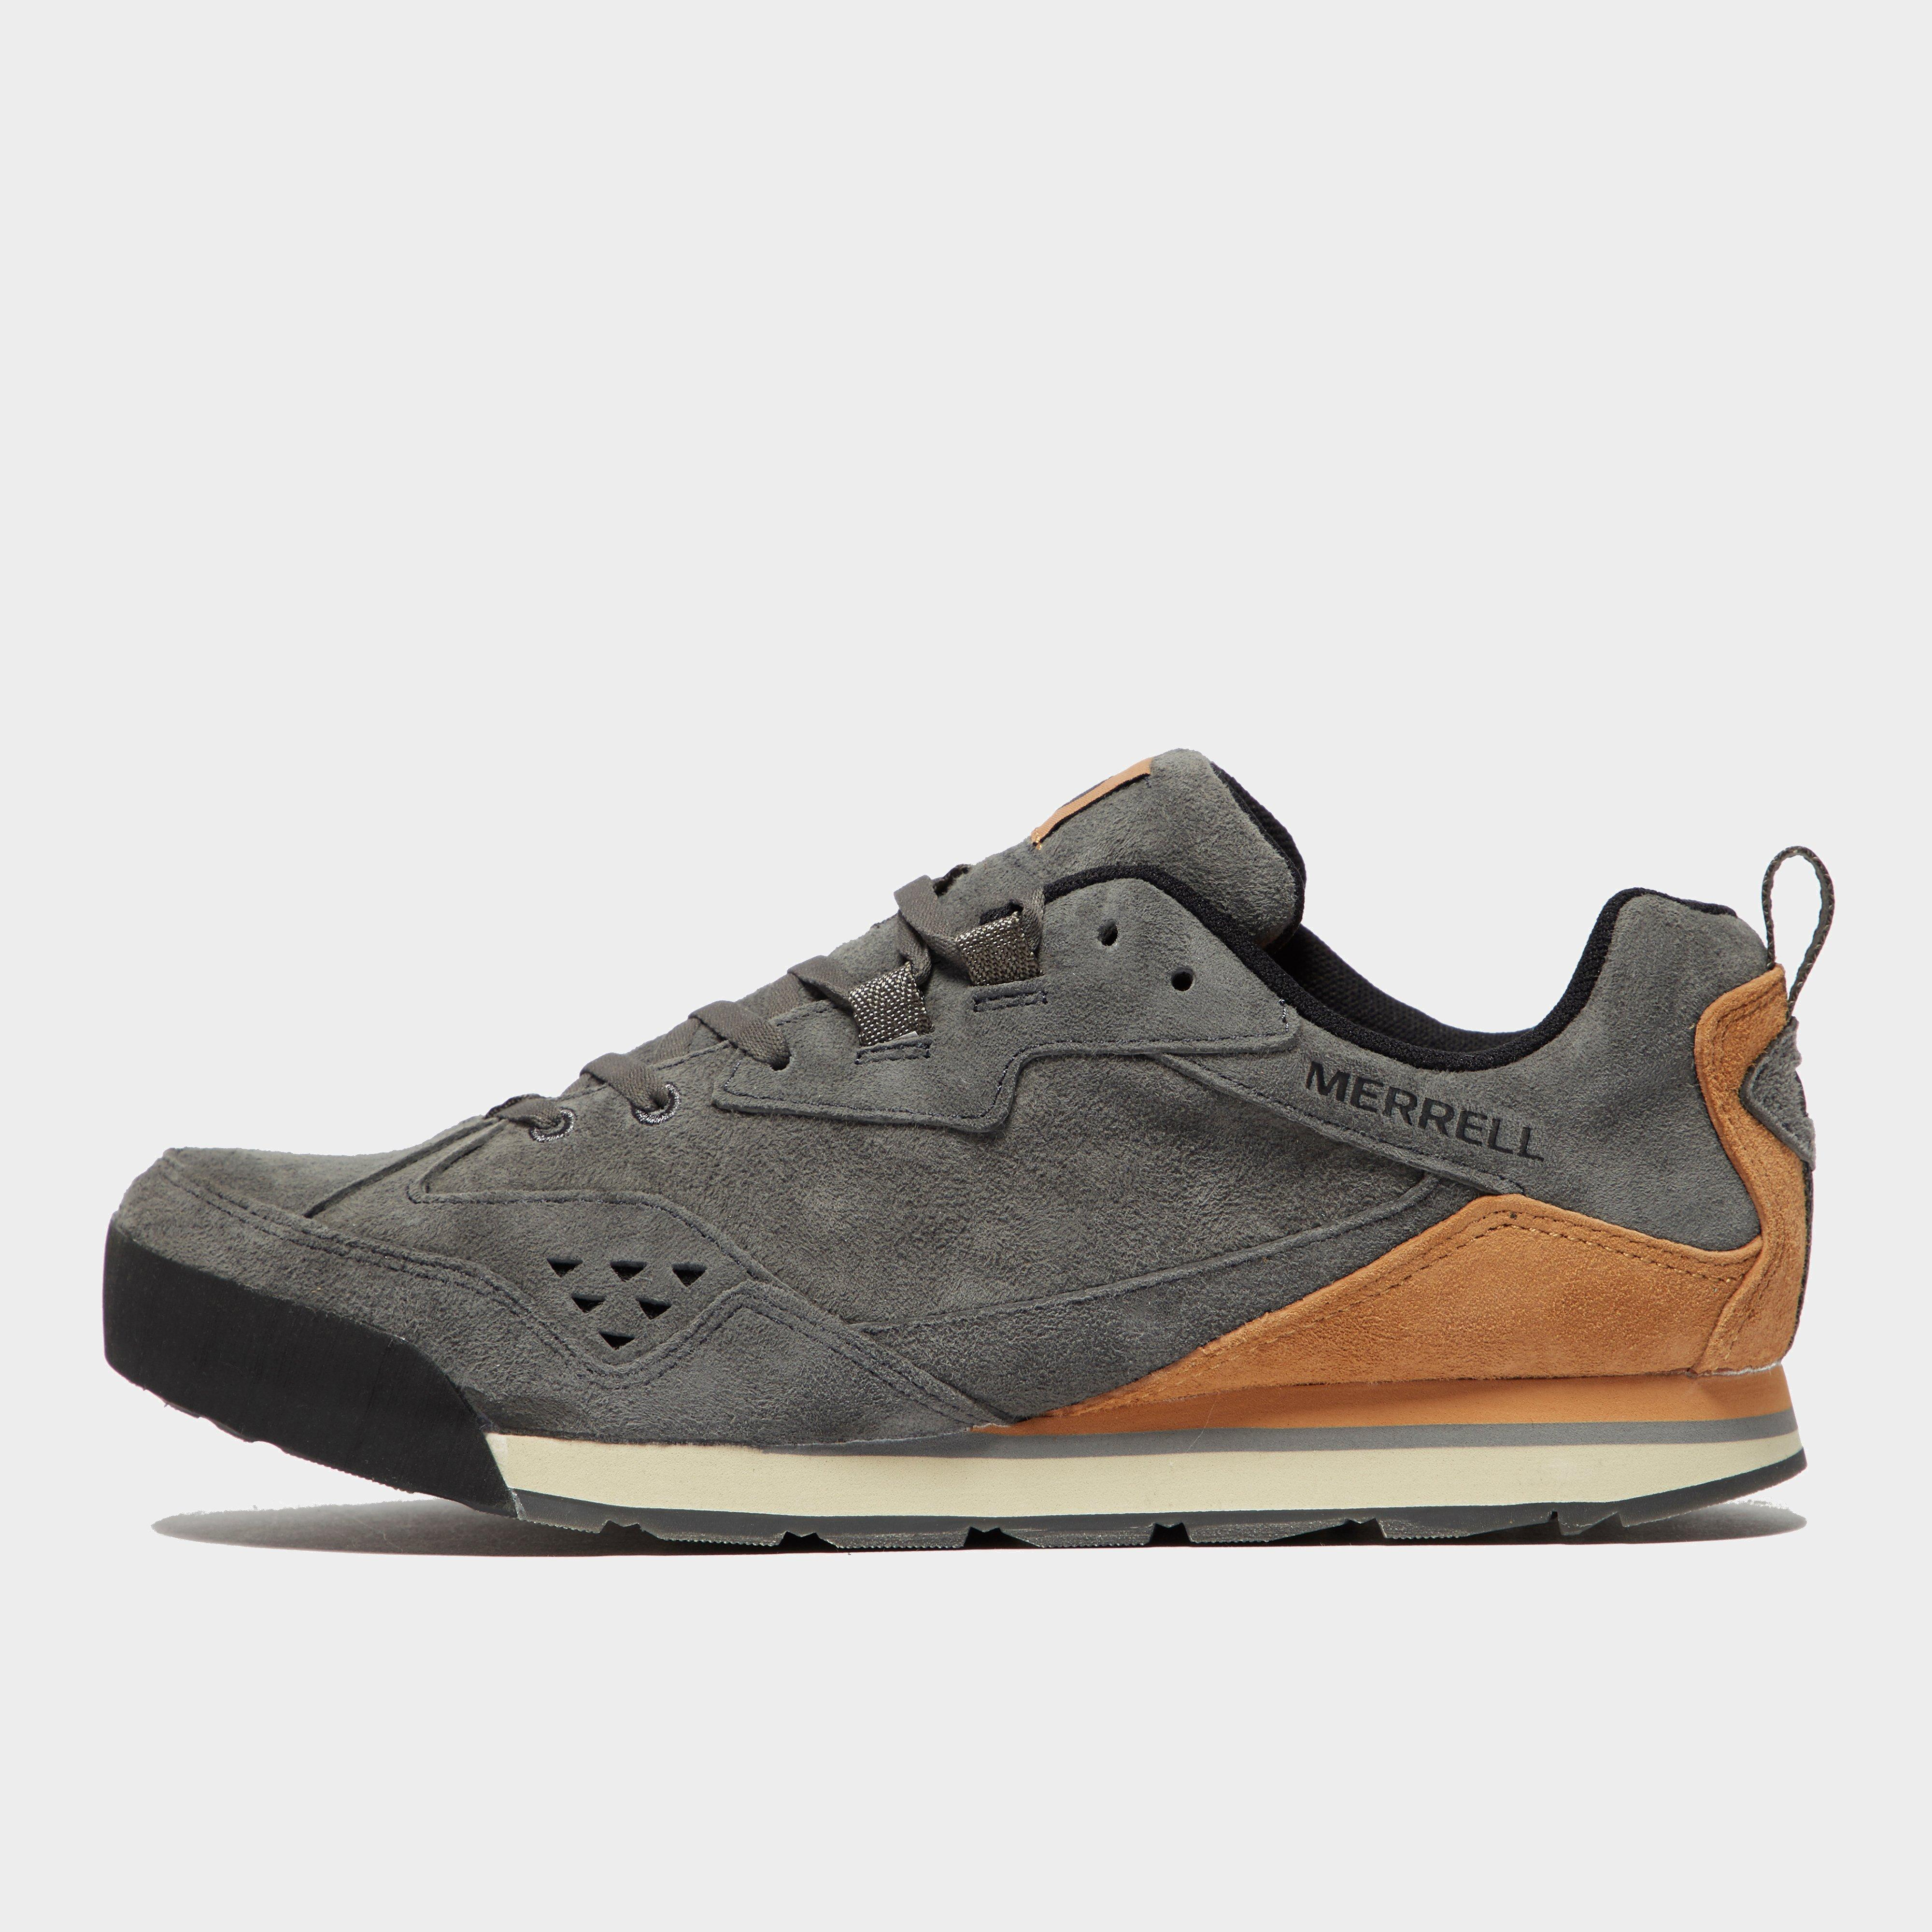 3c758efc6264e Merrell Men's Burnt Rock Tura Suede Shoes